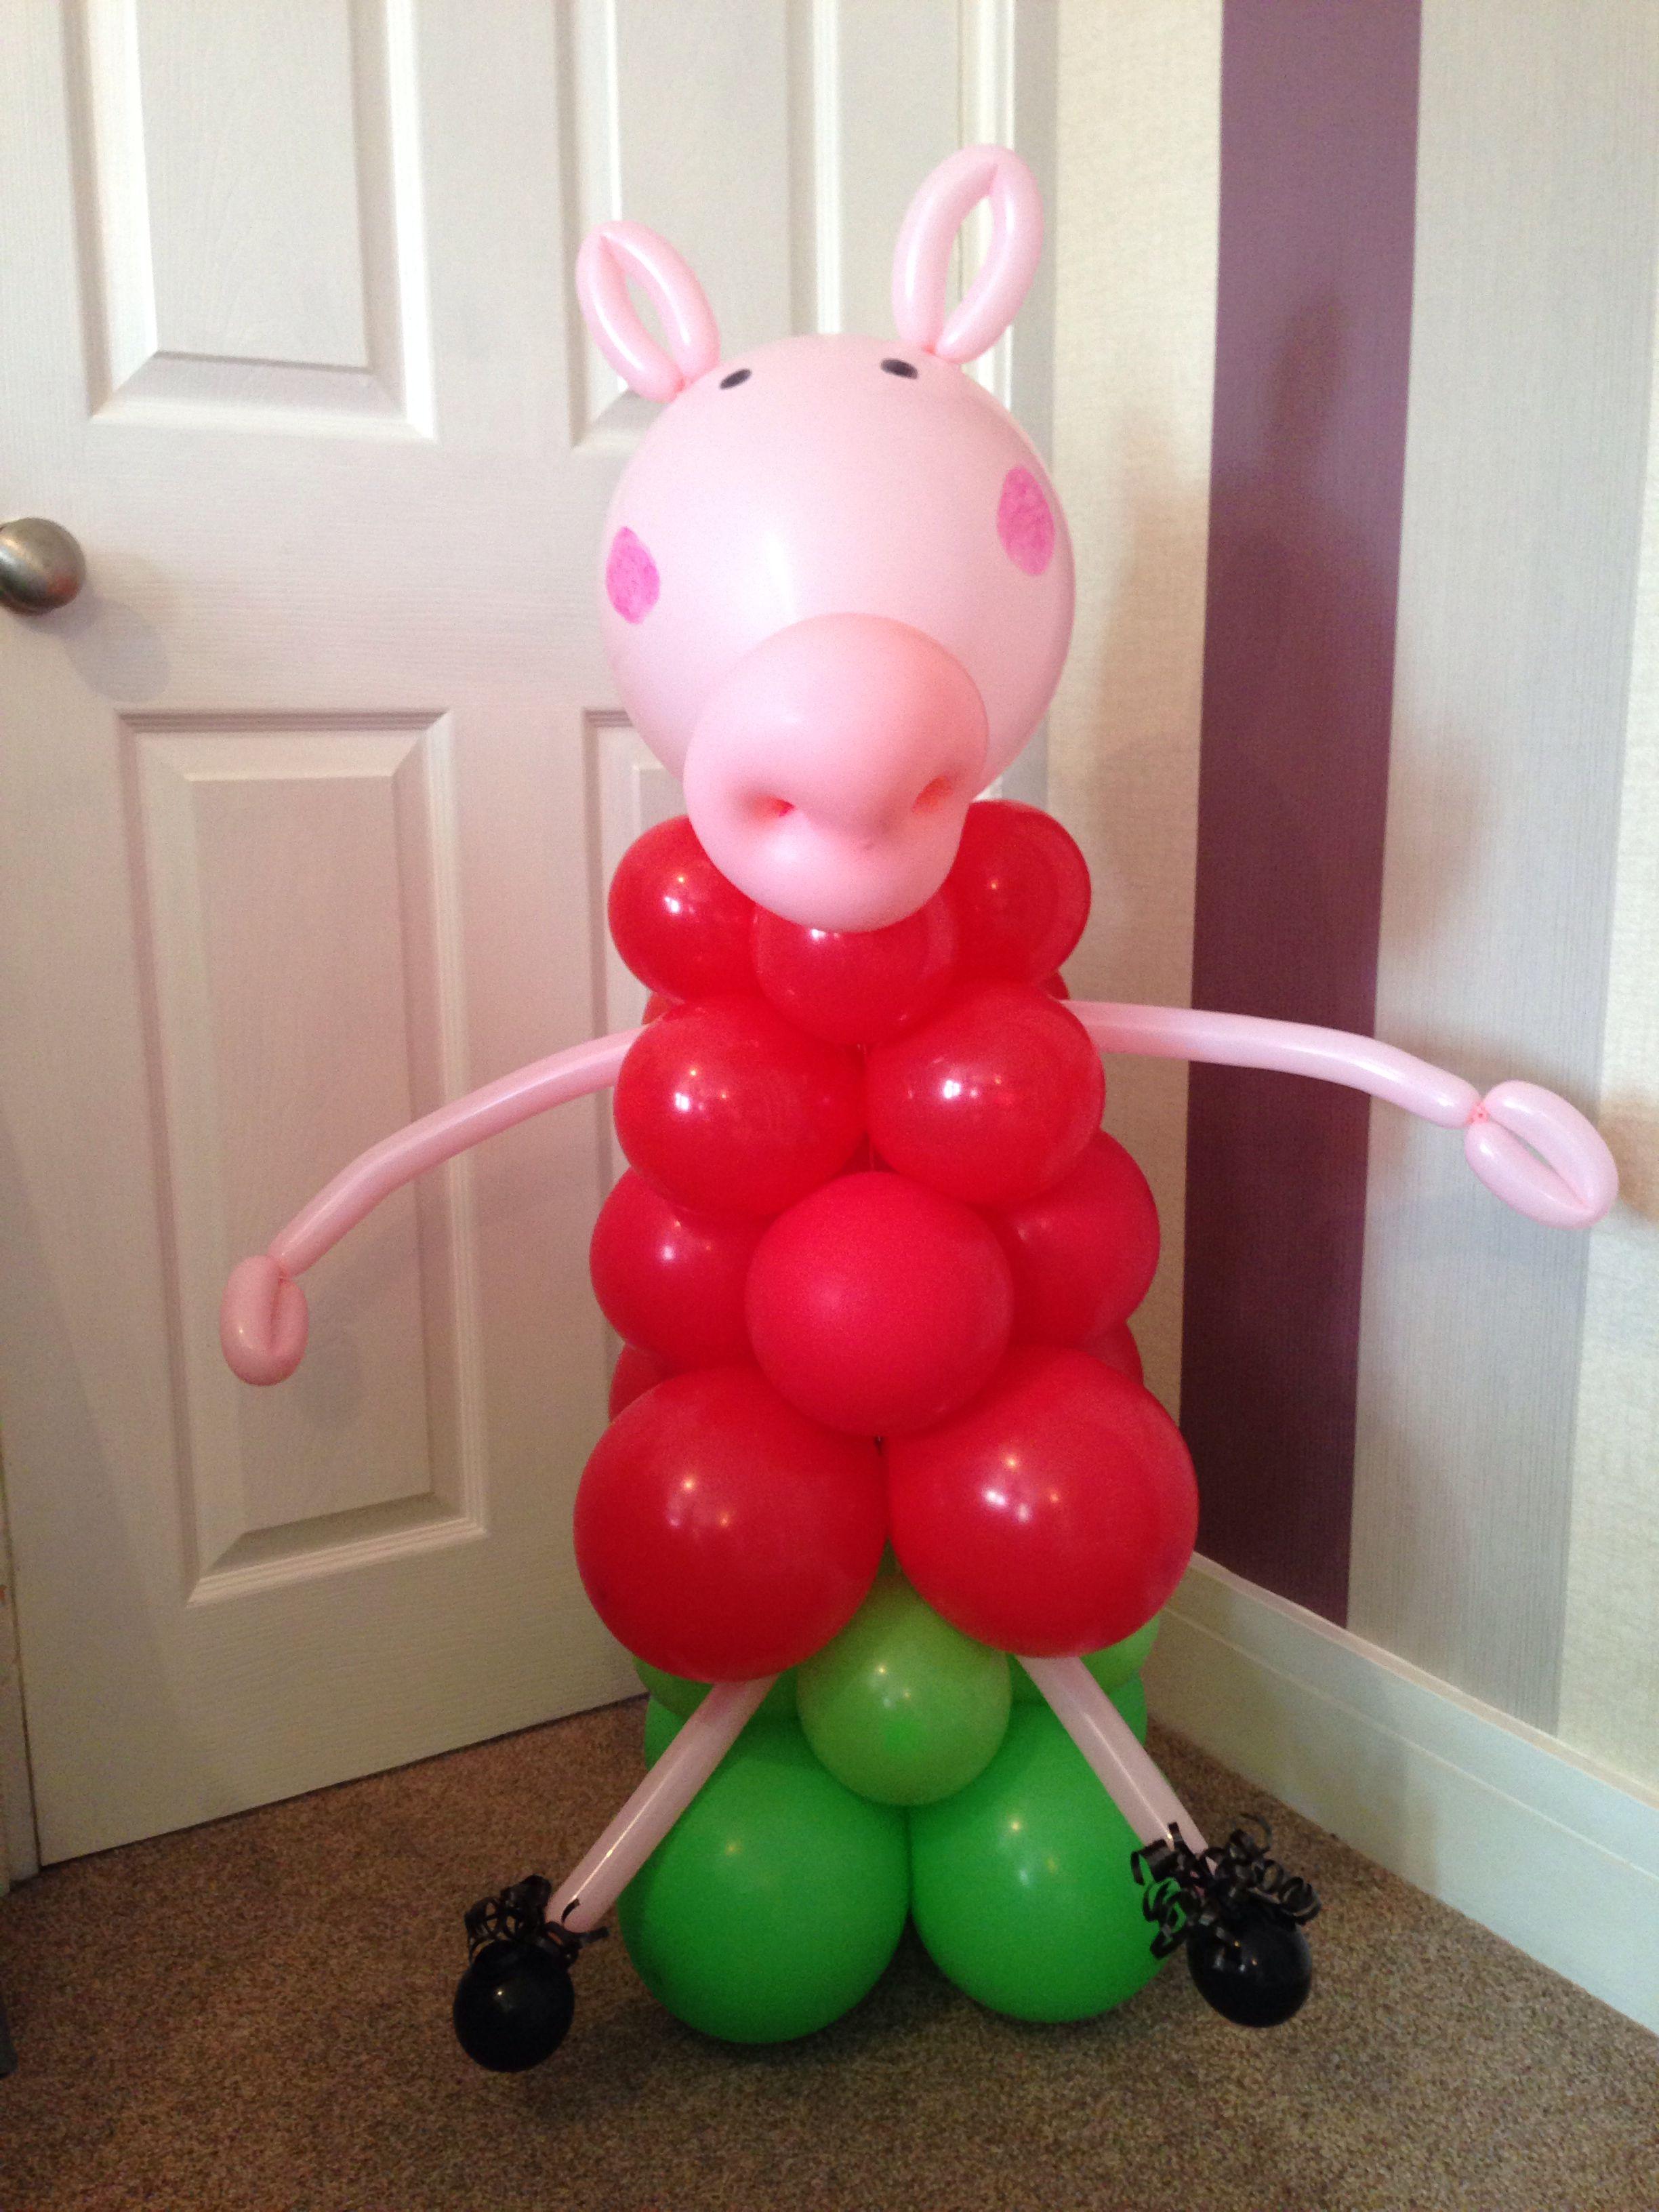 Peppa pig balloon display